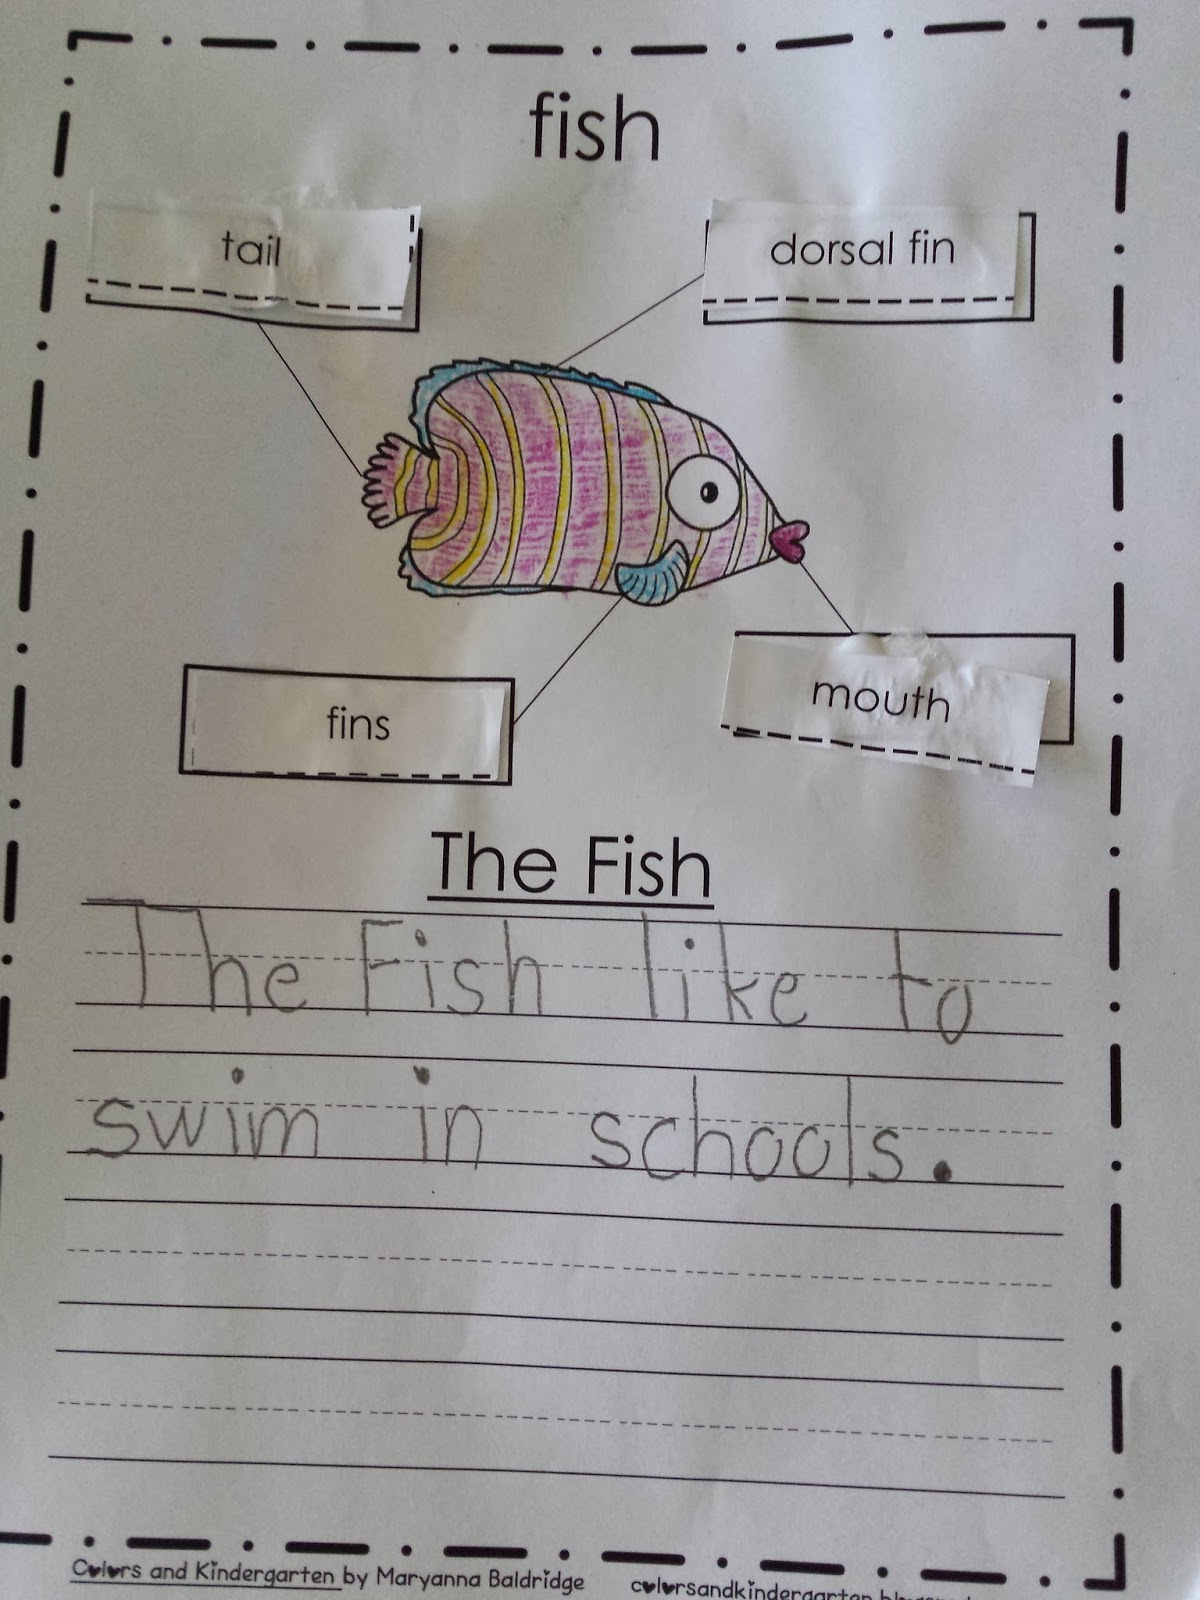 http://www.teacherspayteachers.com/Product/My-Science-Journal-Ocean-1180369